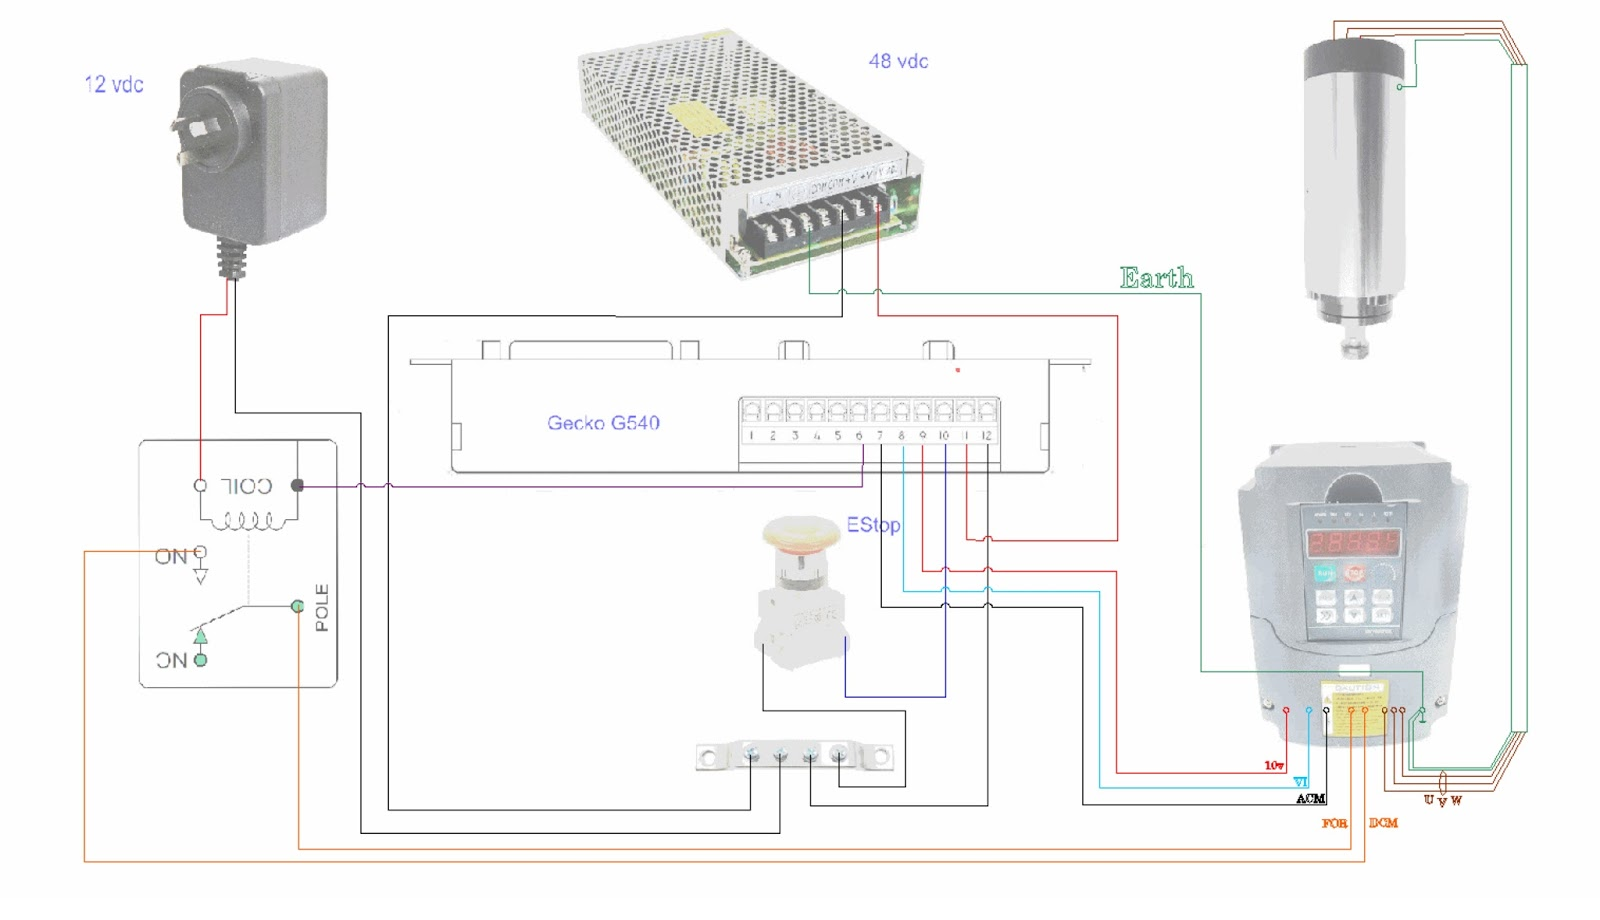 5 axis cnc breakout board wiring diagram uk telephone plug mach3 spindle relay wheels elsavadorla